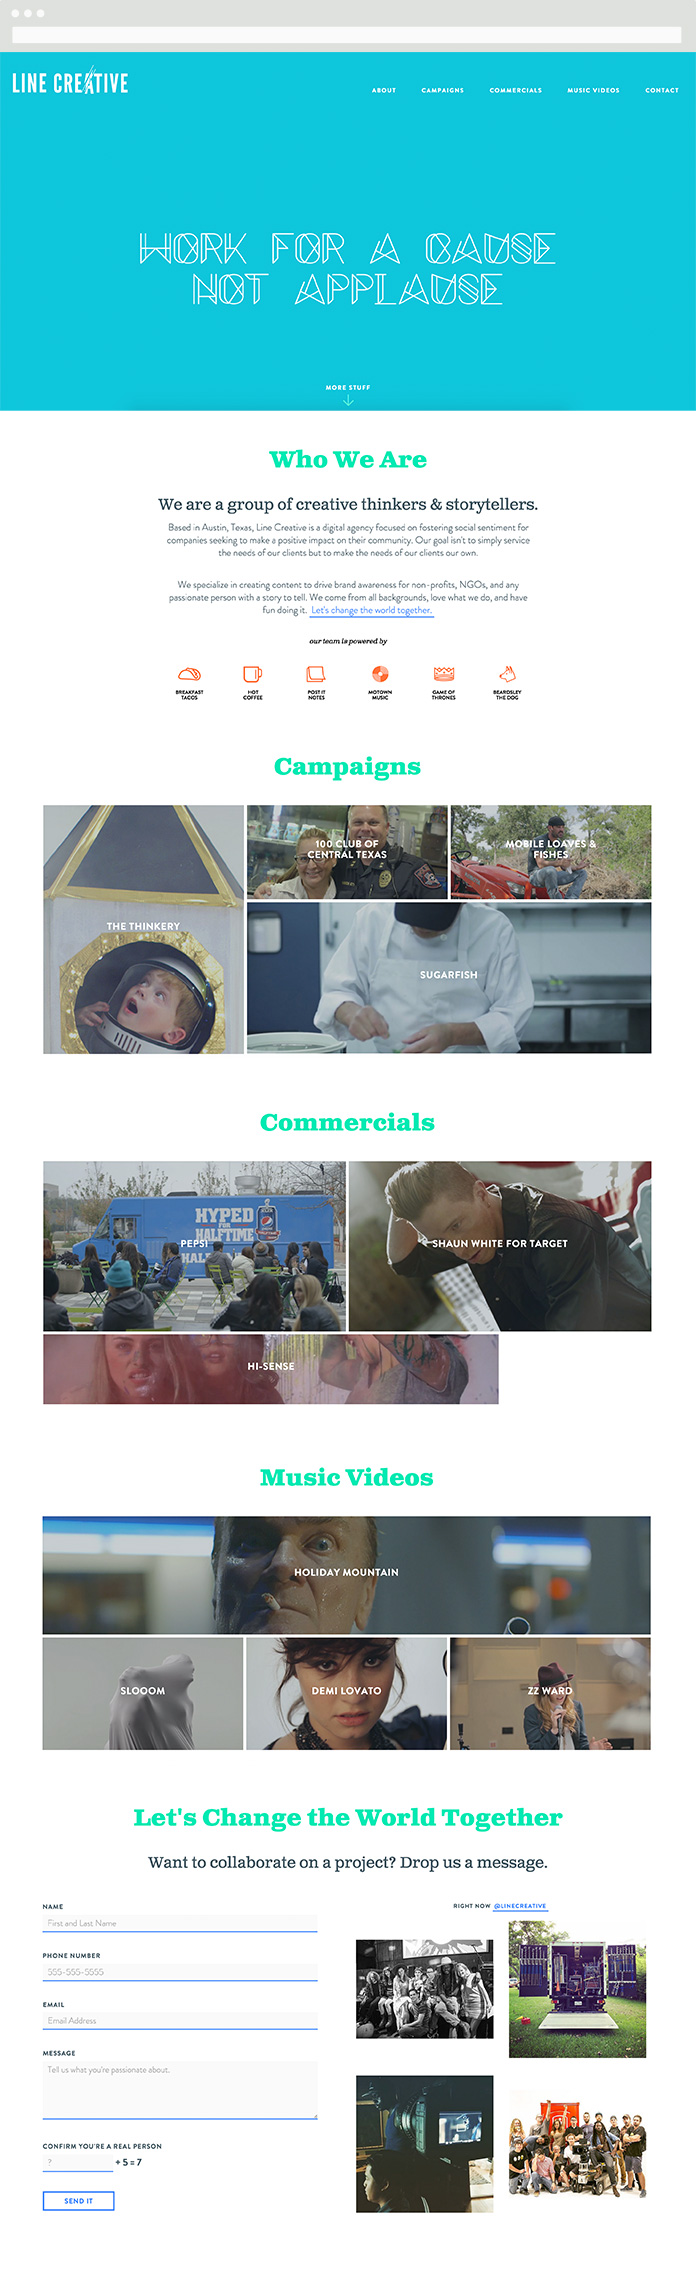 Image of Line Creative Homepage